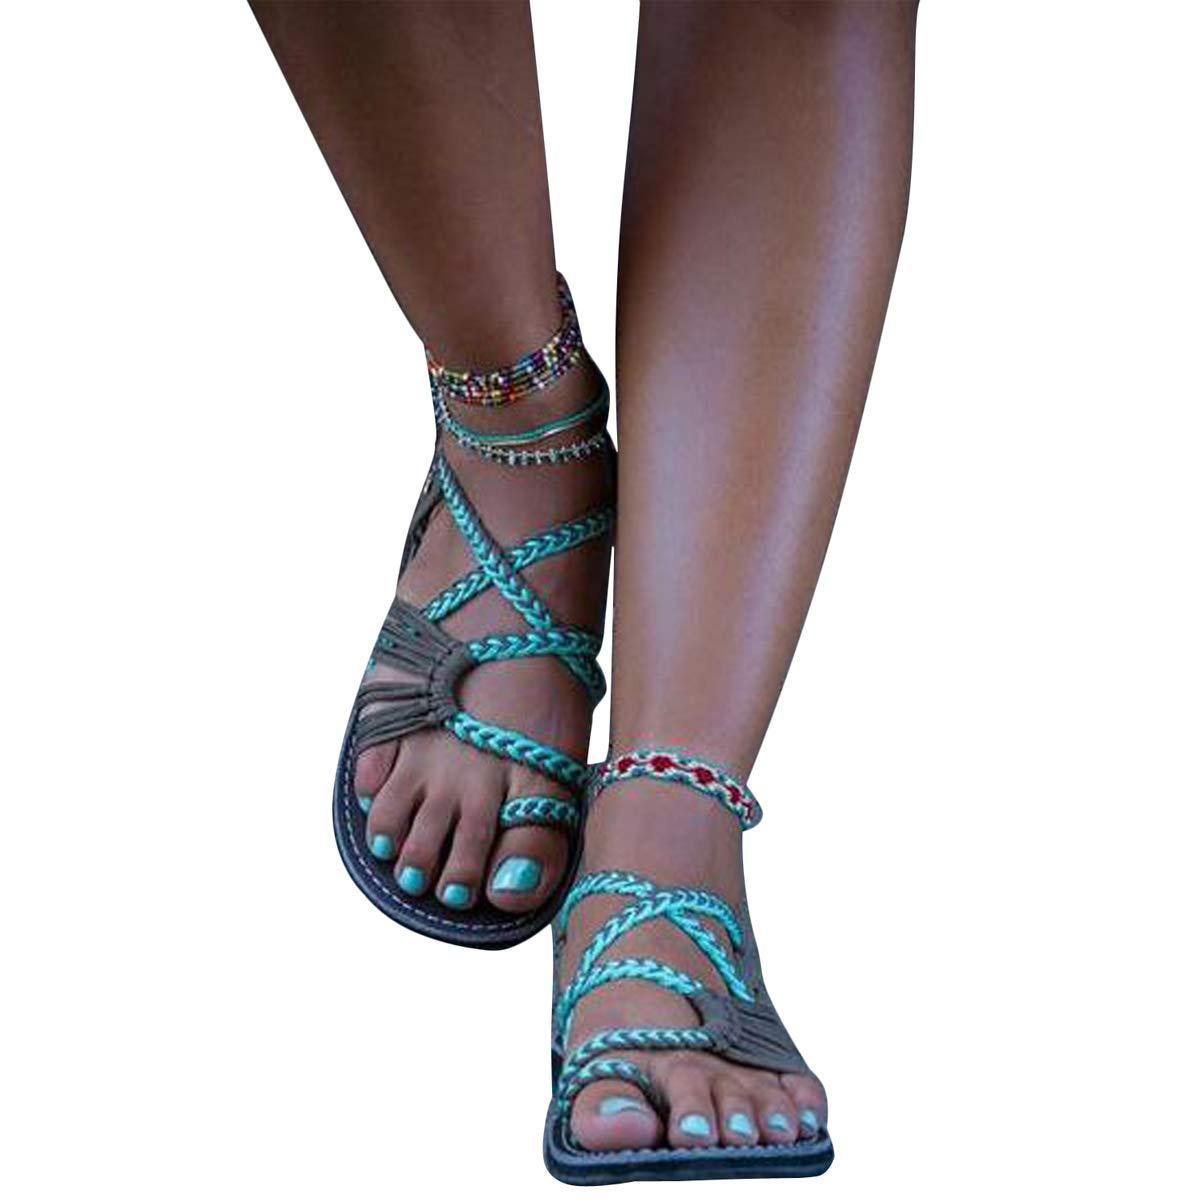 Sandales Sandales Femme Tressée Sandales Vert Femmes Chaussures de Plage Plats Chaussures Bohême Clip Toe Herringbone Flip Flops X Vert 96edc0b - deadsea.space